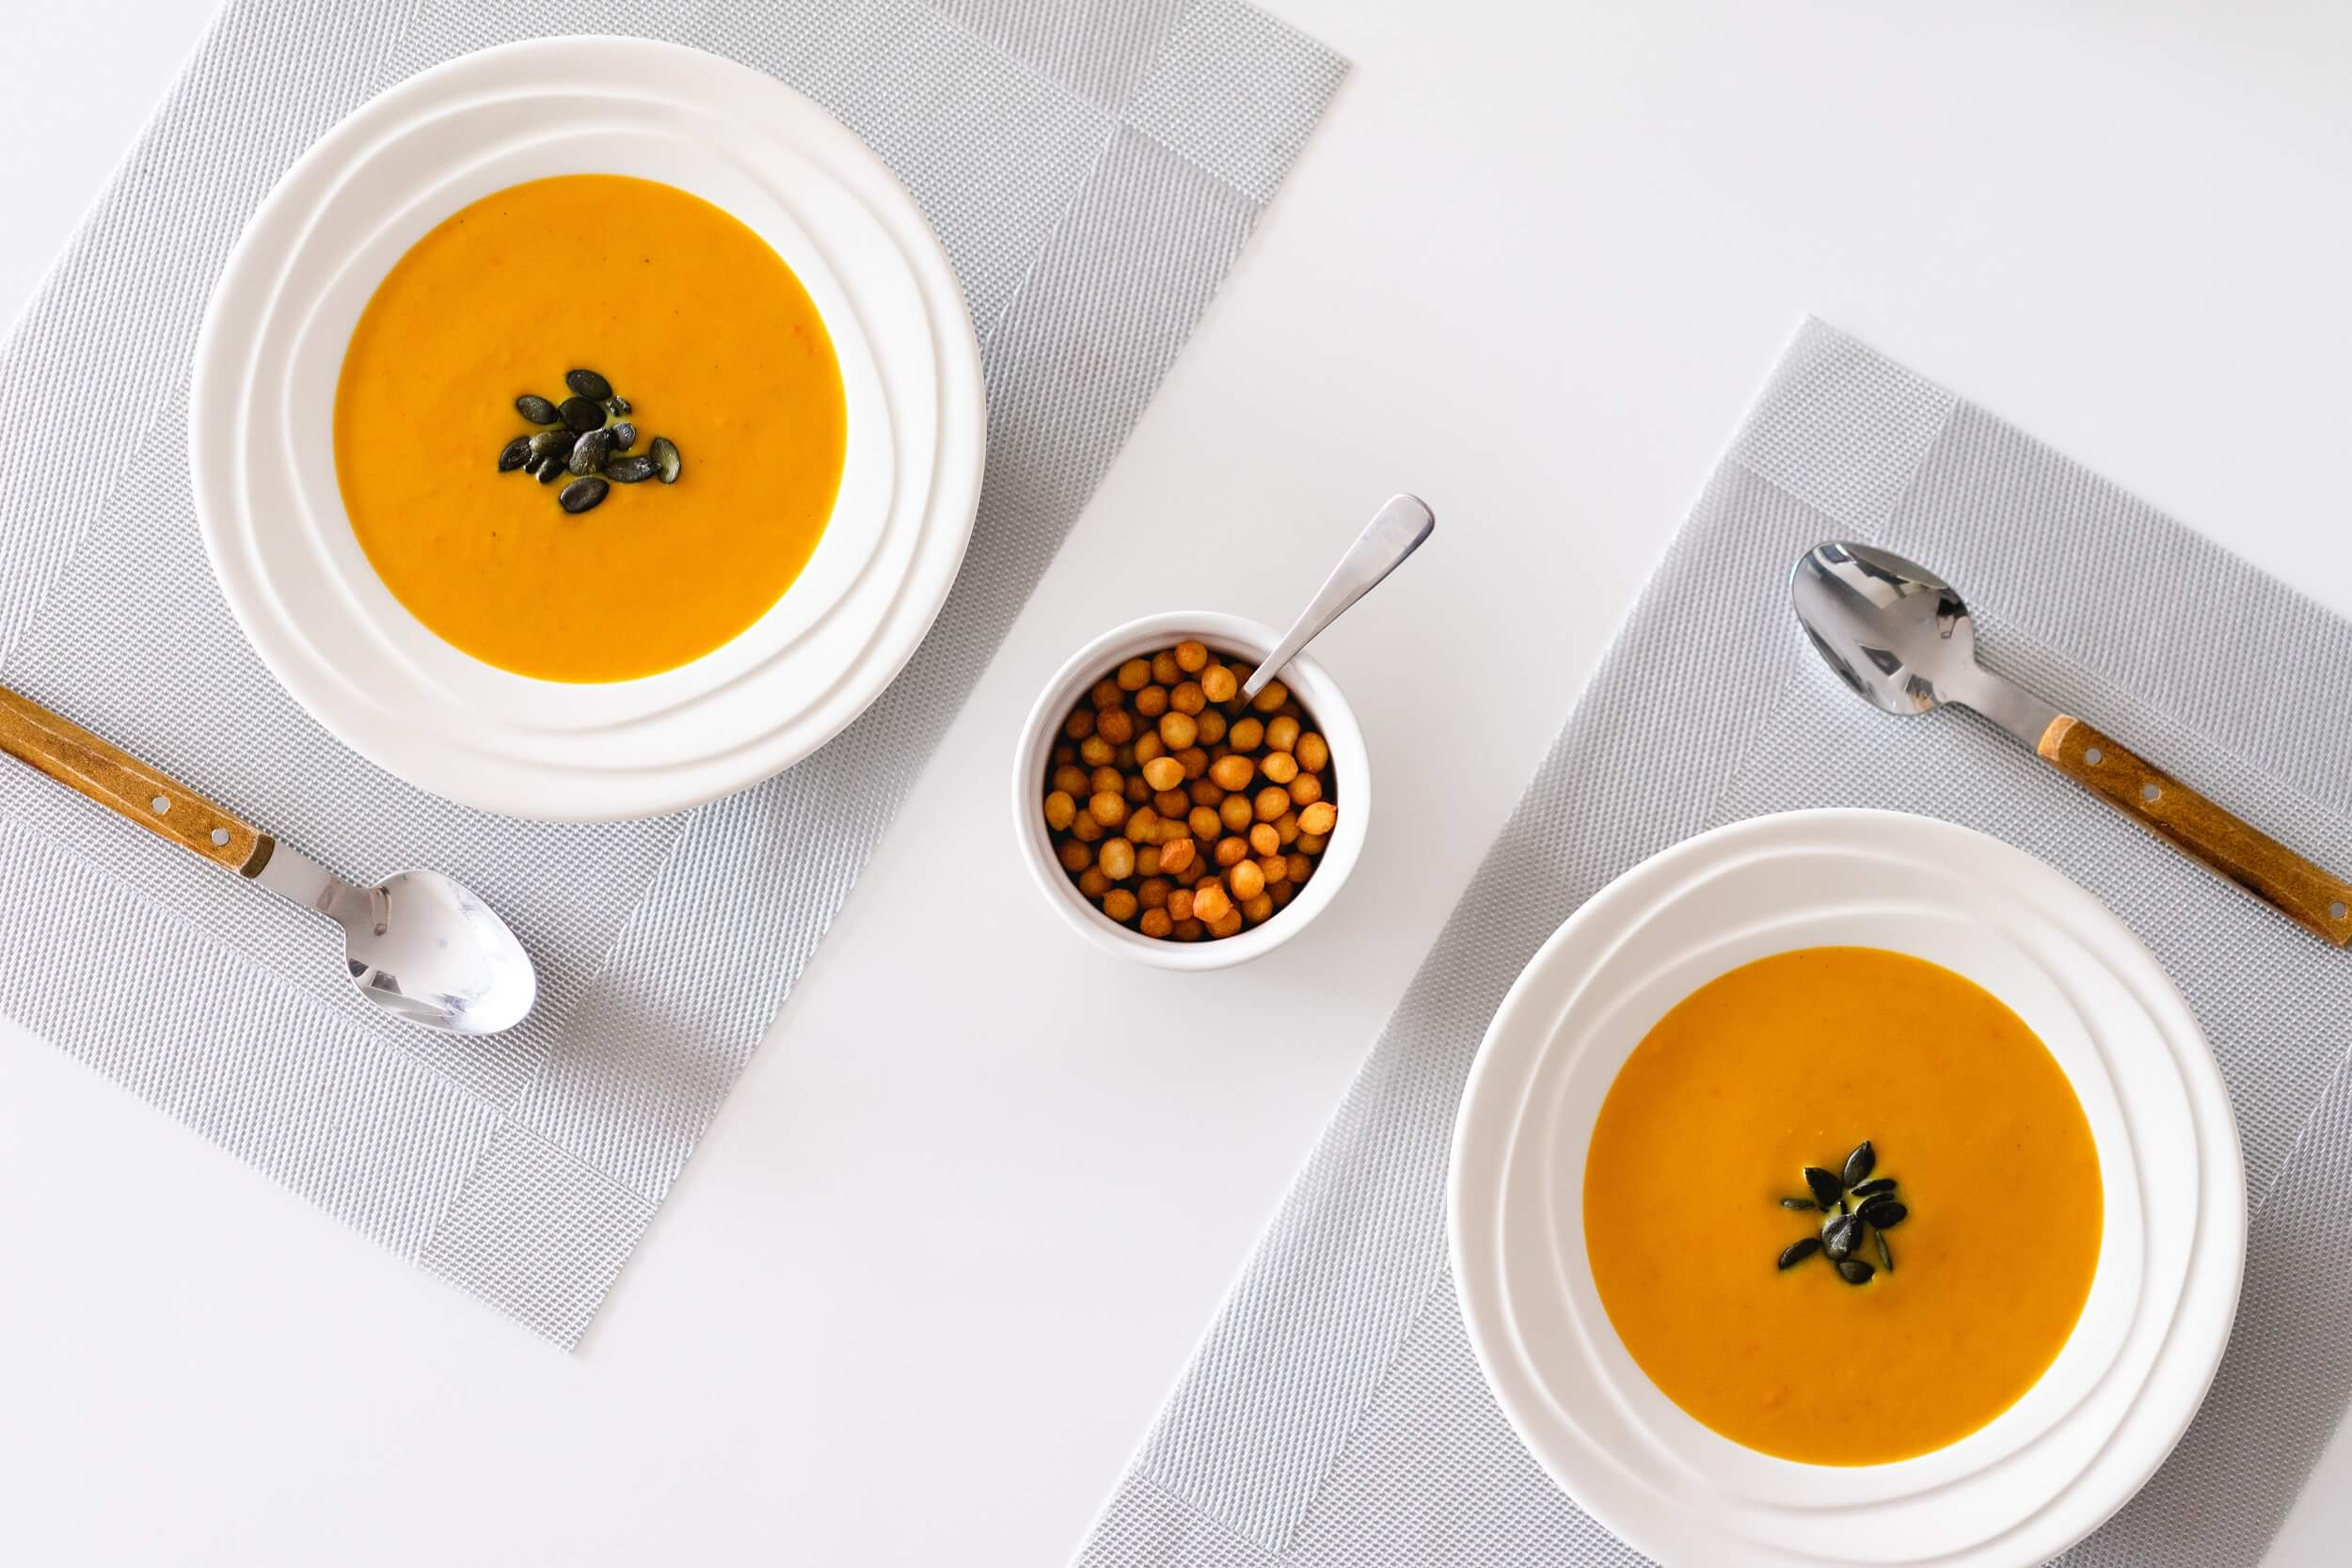 pumpkin-soup-picjumbo-com (R) (1).jpg